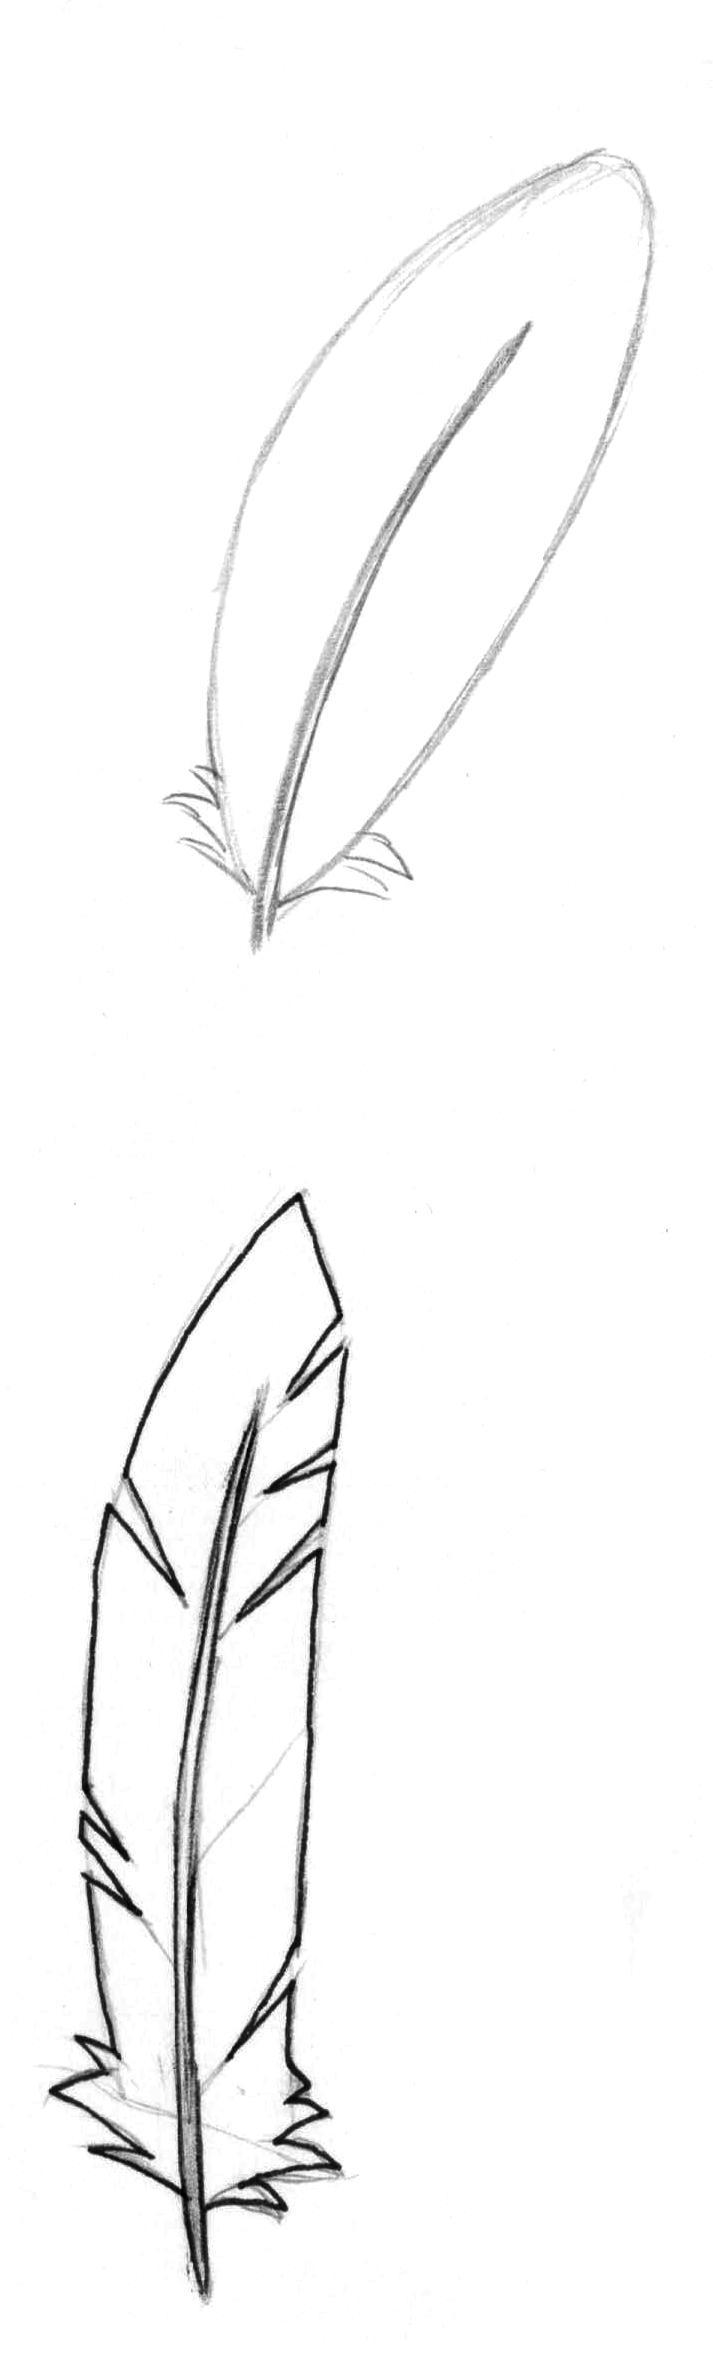 Рисуем перья карандашом - шаг 5